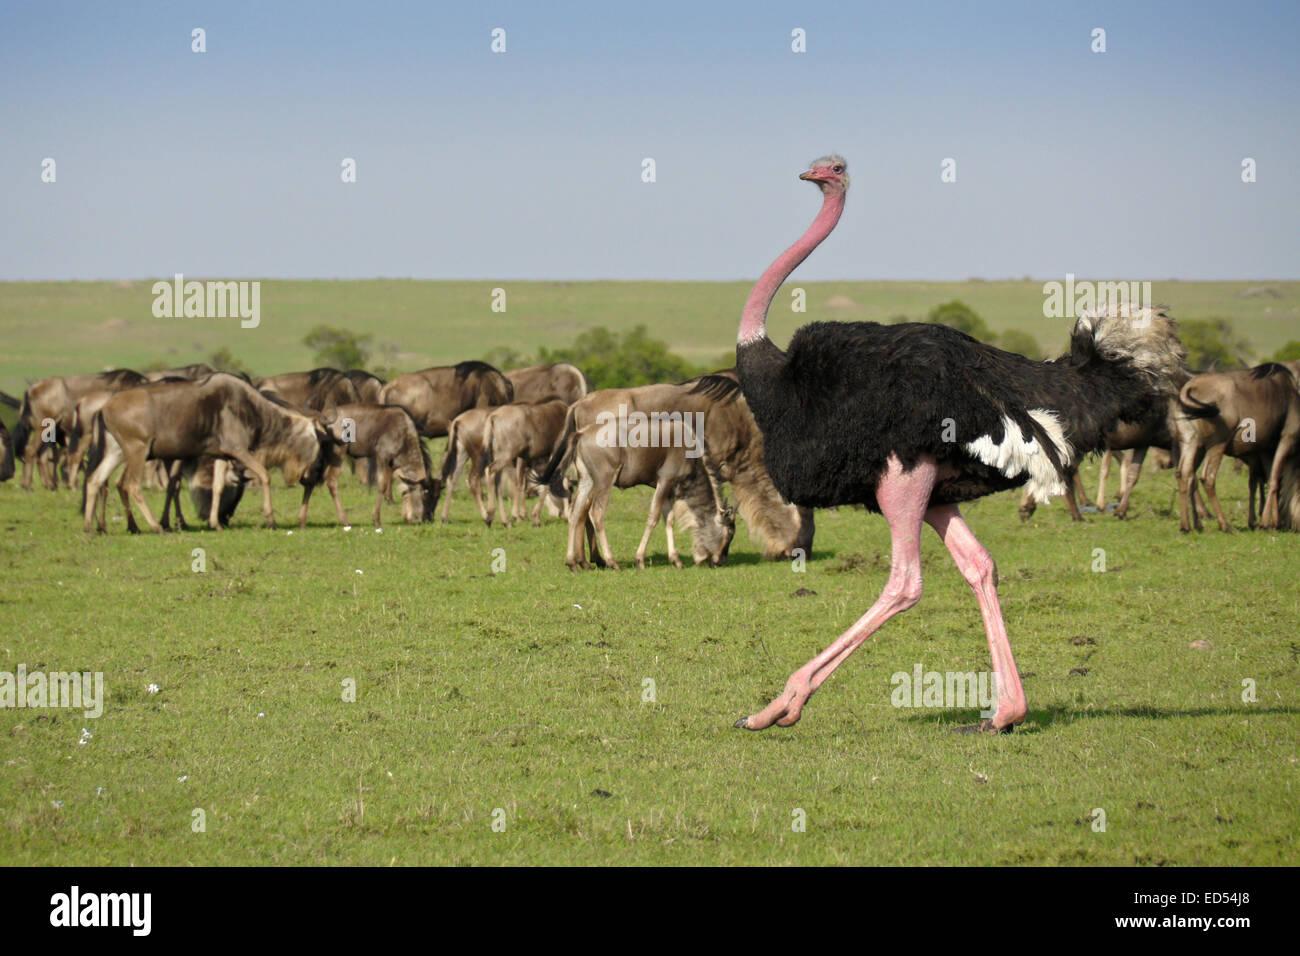 Male Masai ostrich, in pink mating color, walking among wildebeests, Masai Mara, Kenya - Stock Image